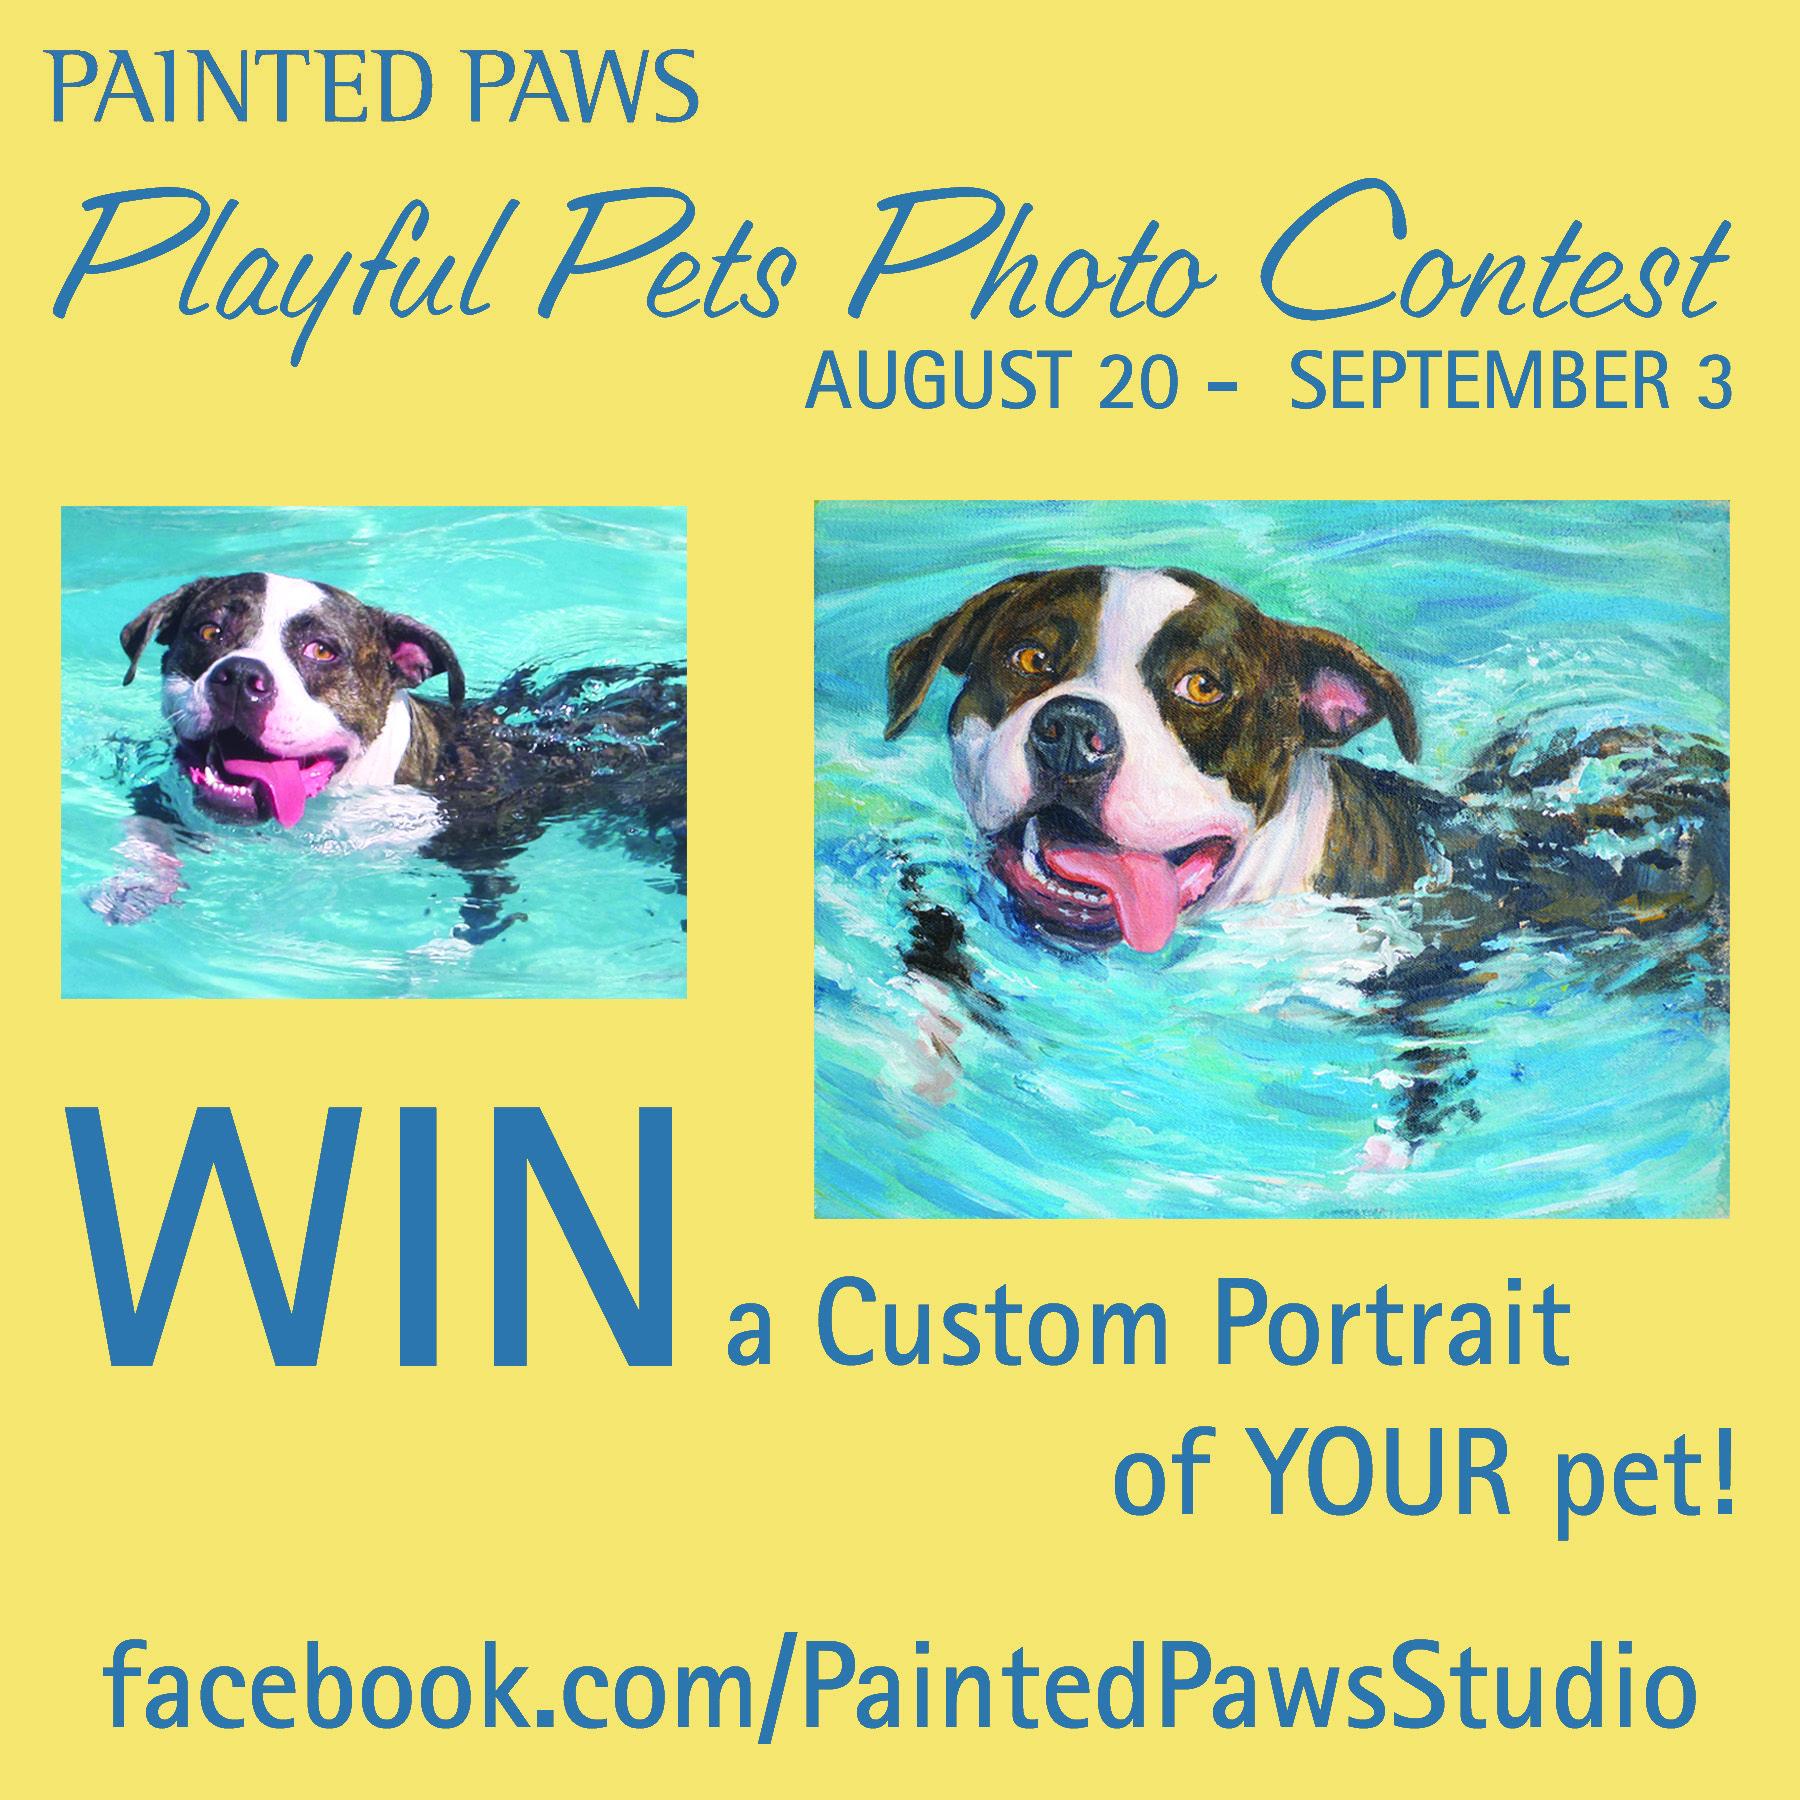 Win A Custom Pet Painting Facebook Com Paintedpawsstudio For Details Playfulpet Custompetportrait Paint Custom Pet Portraits Pet Photo Contest Paw Painting